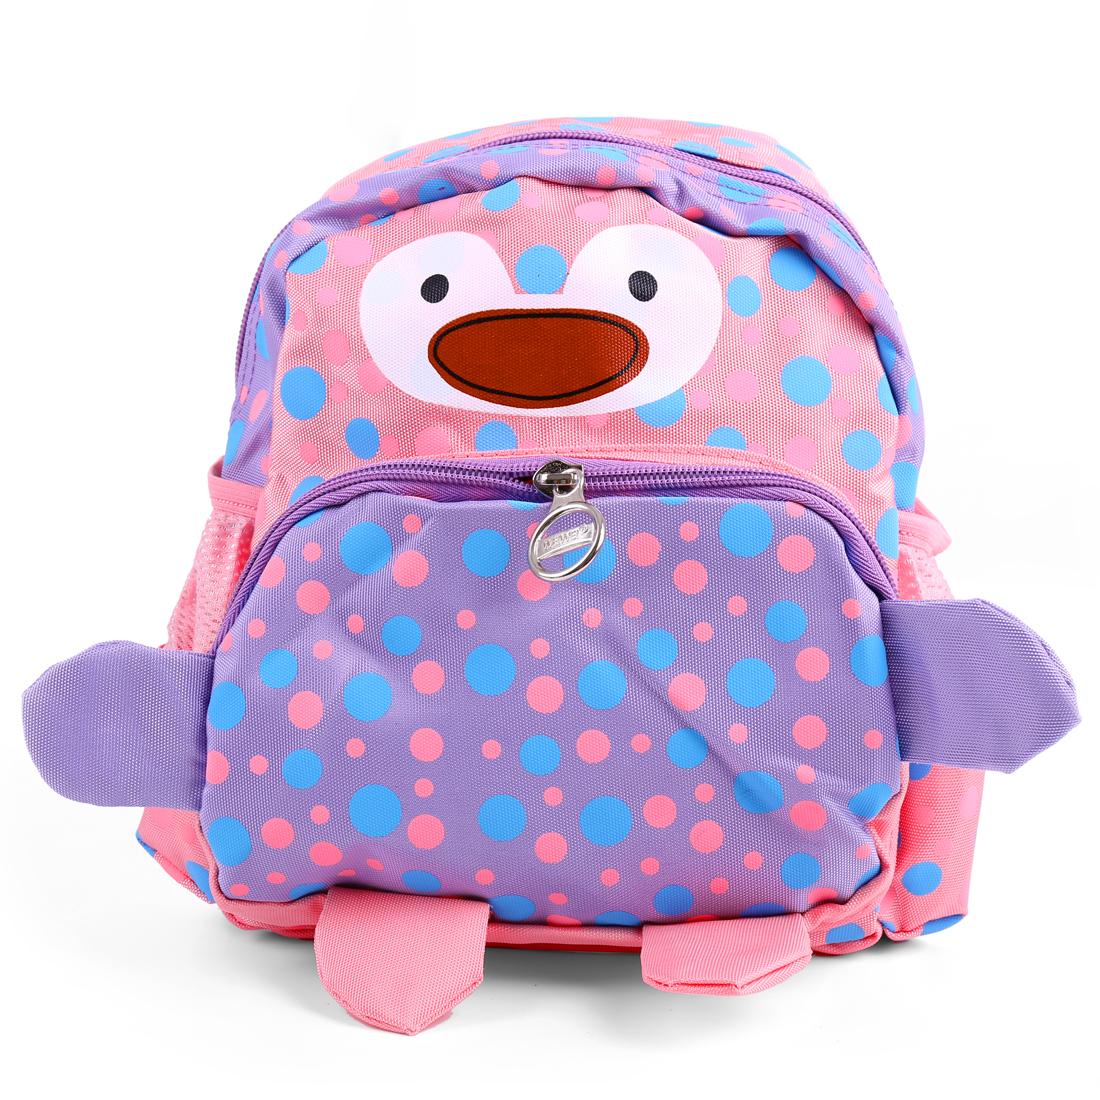 Kids Zip Closure Dots Cartoon Stylish Backpacks Pink Lilac